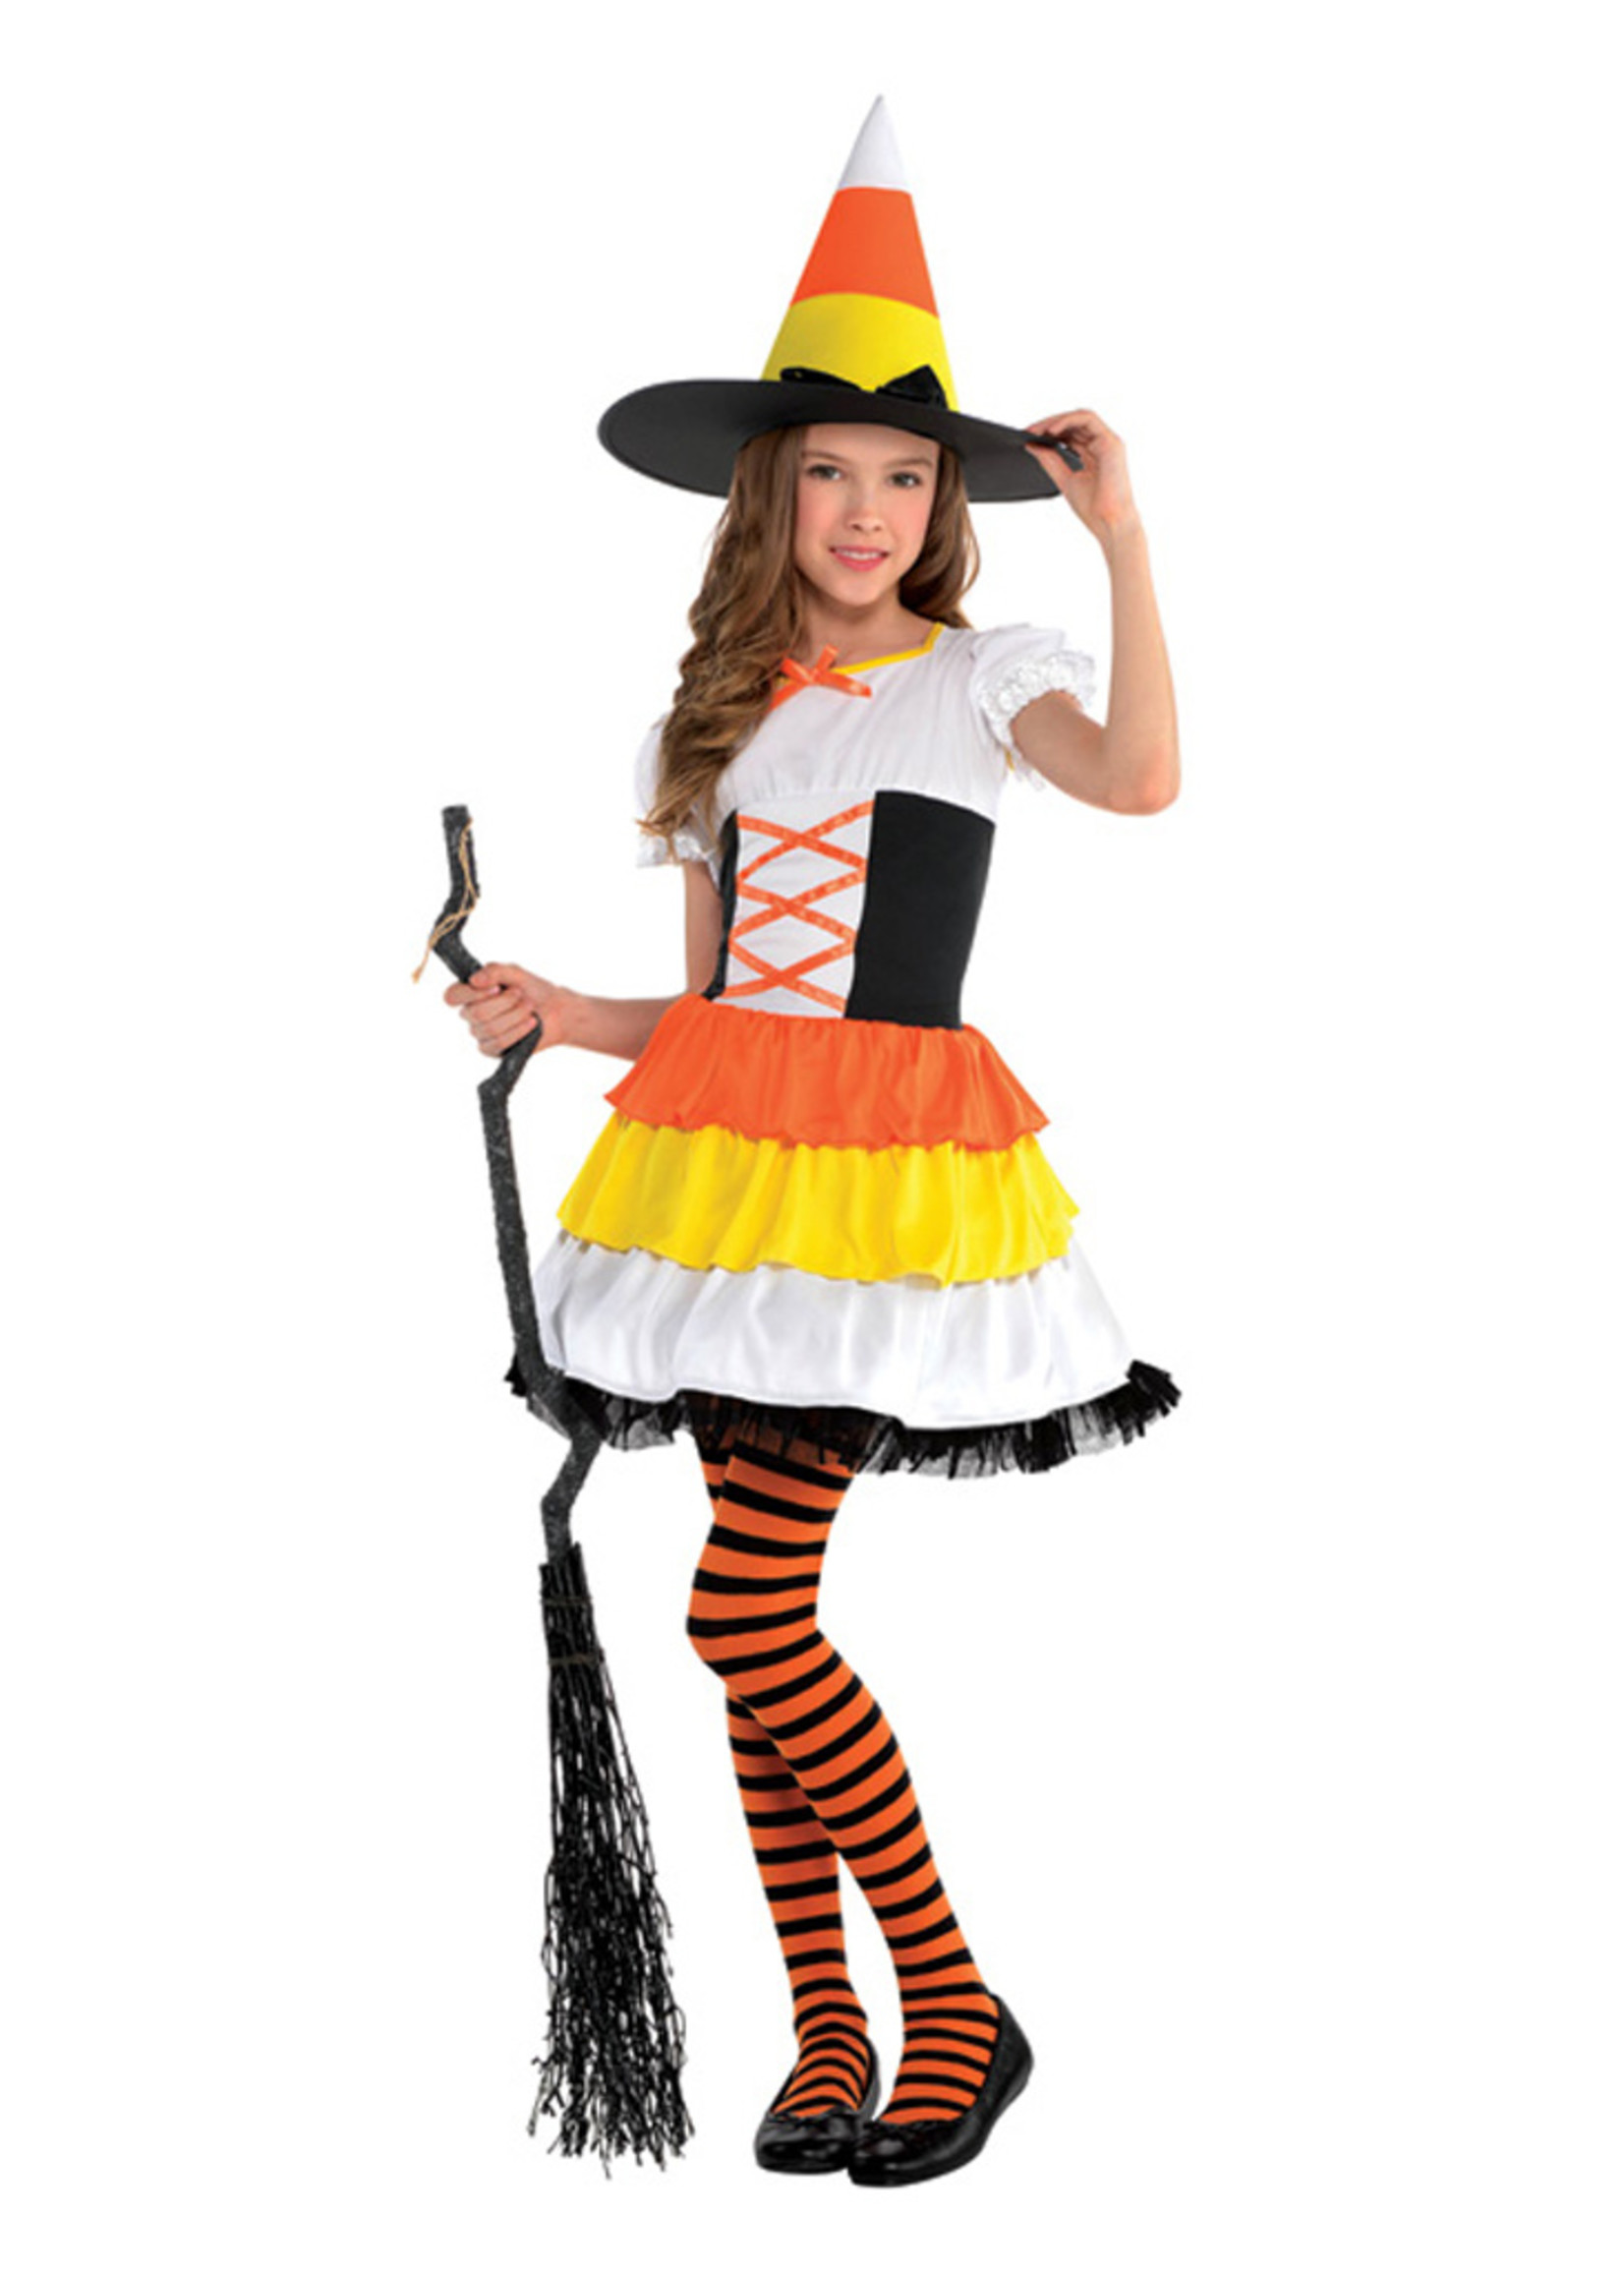 Trick or Treat Costume - Girls